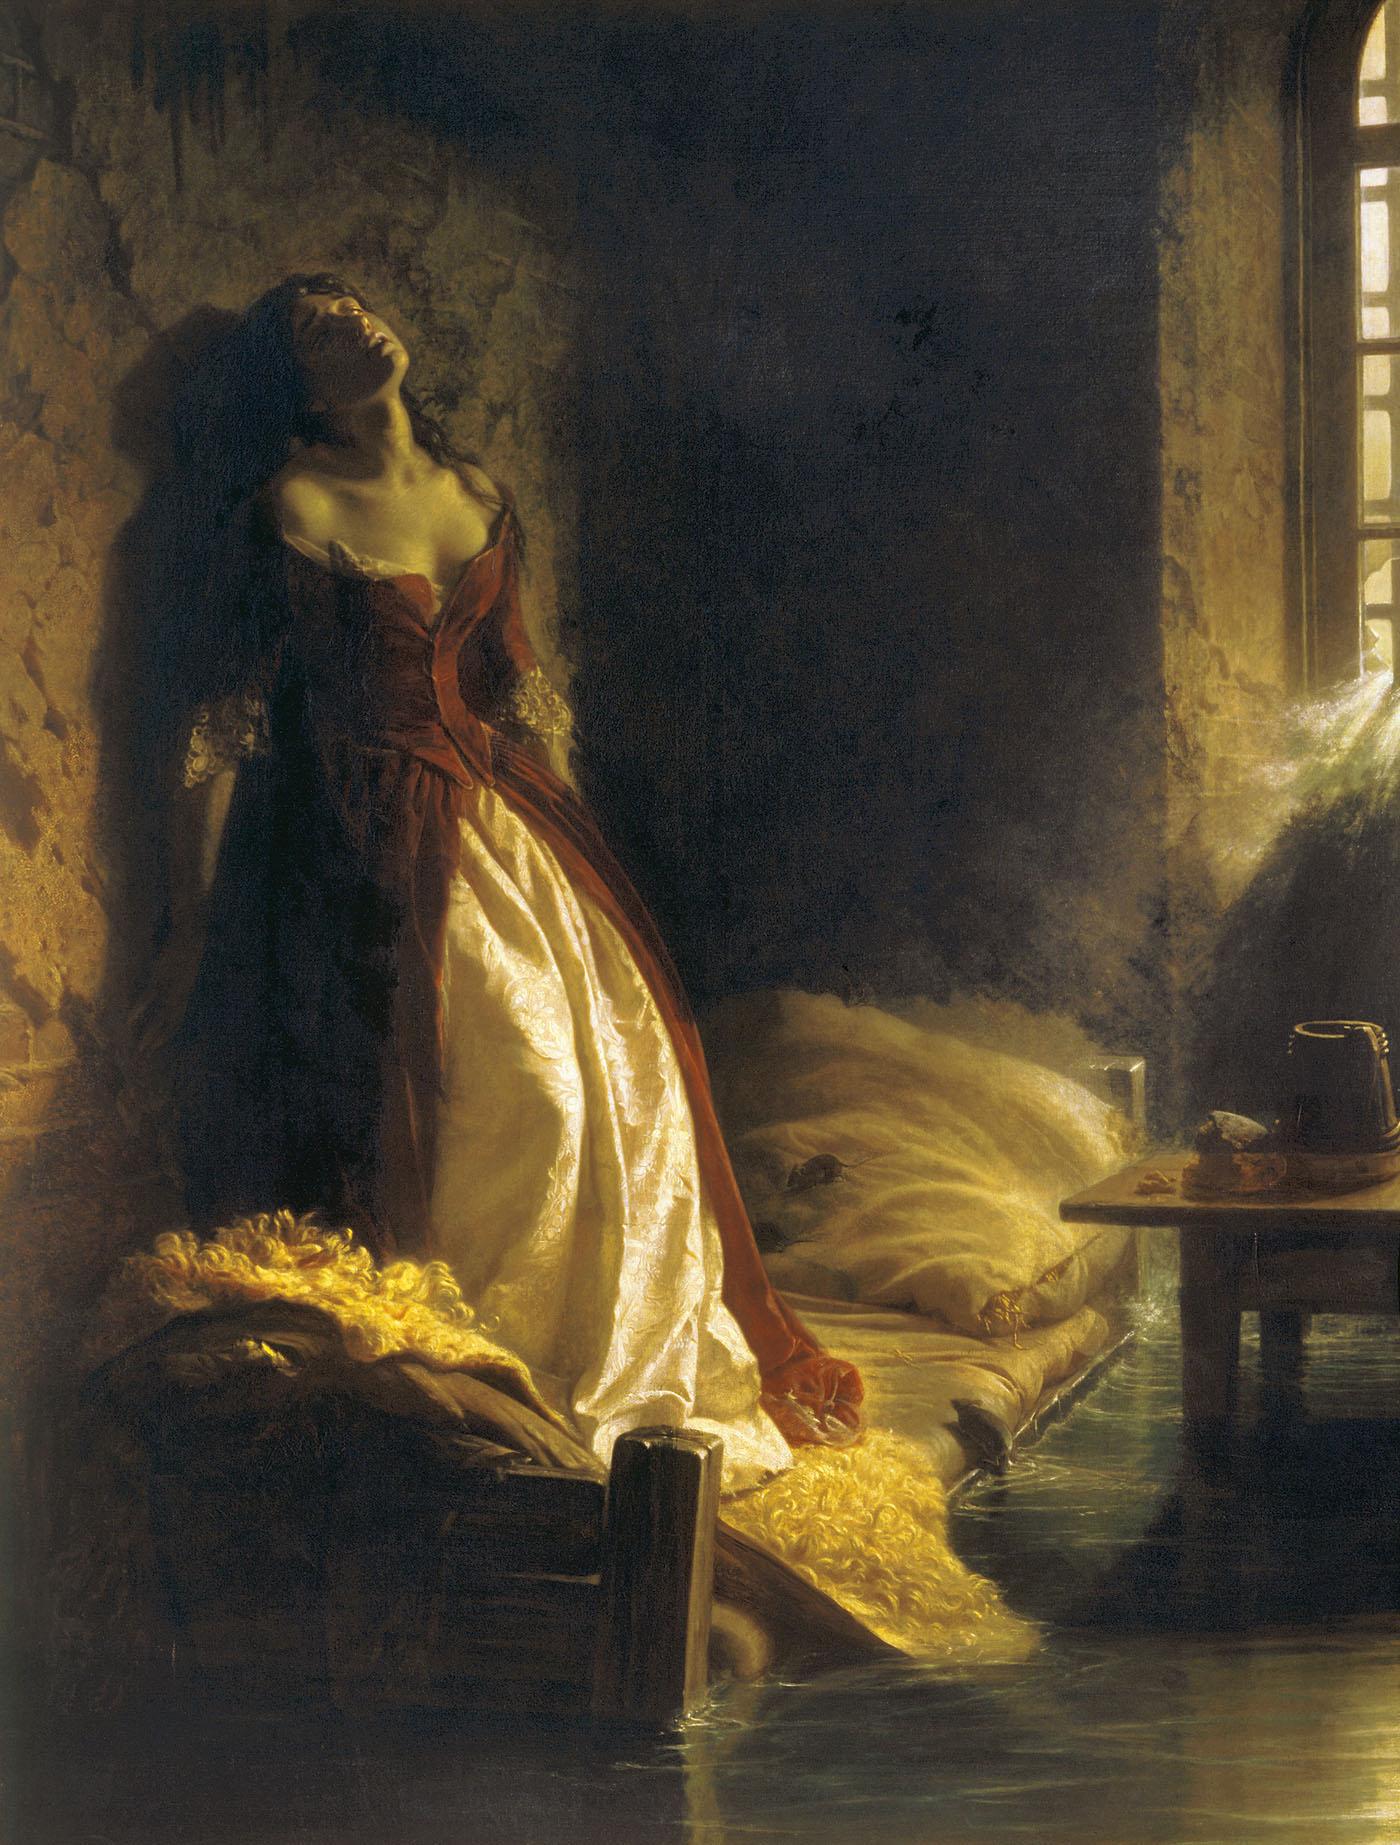 флавицкий княжна тараканова история картины Кристина происходит